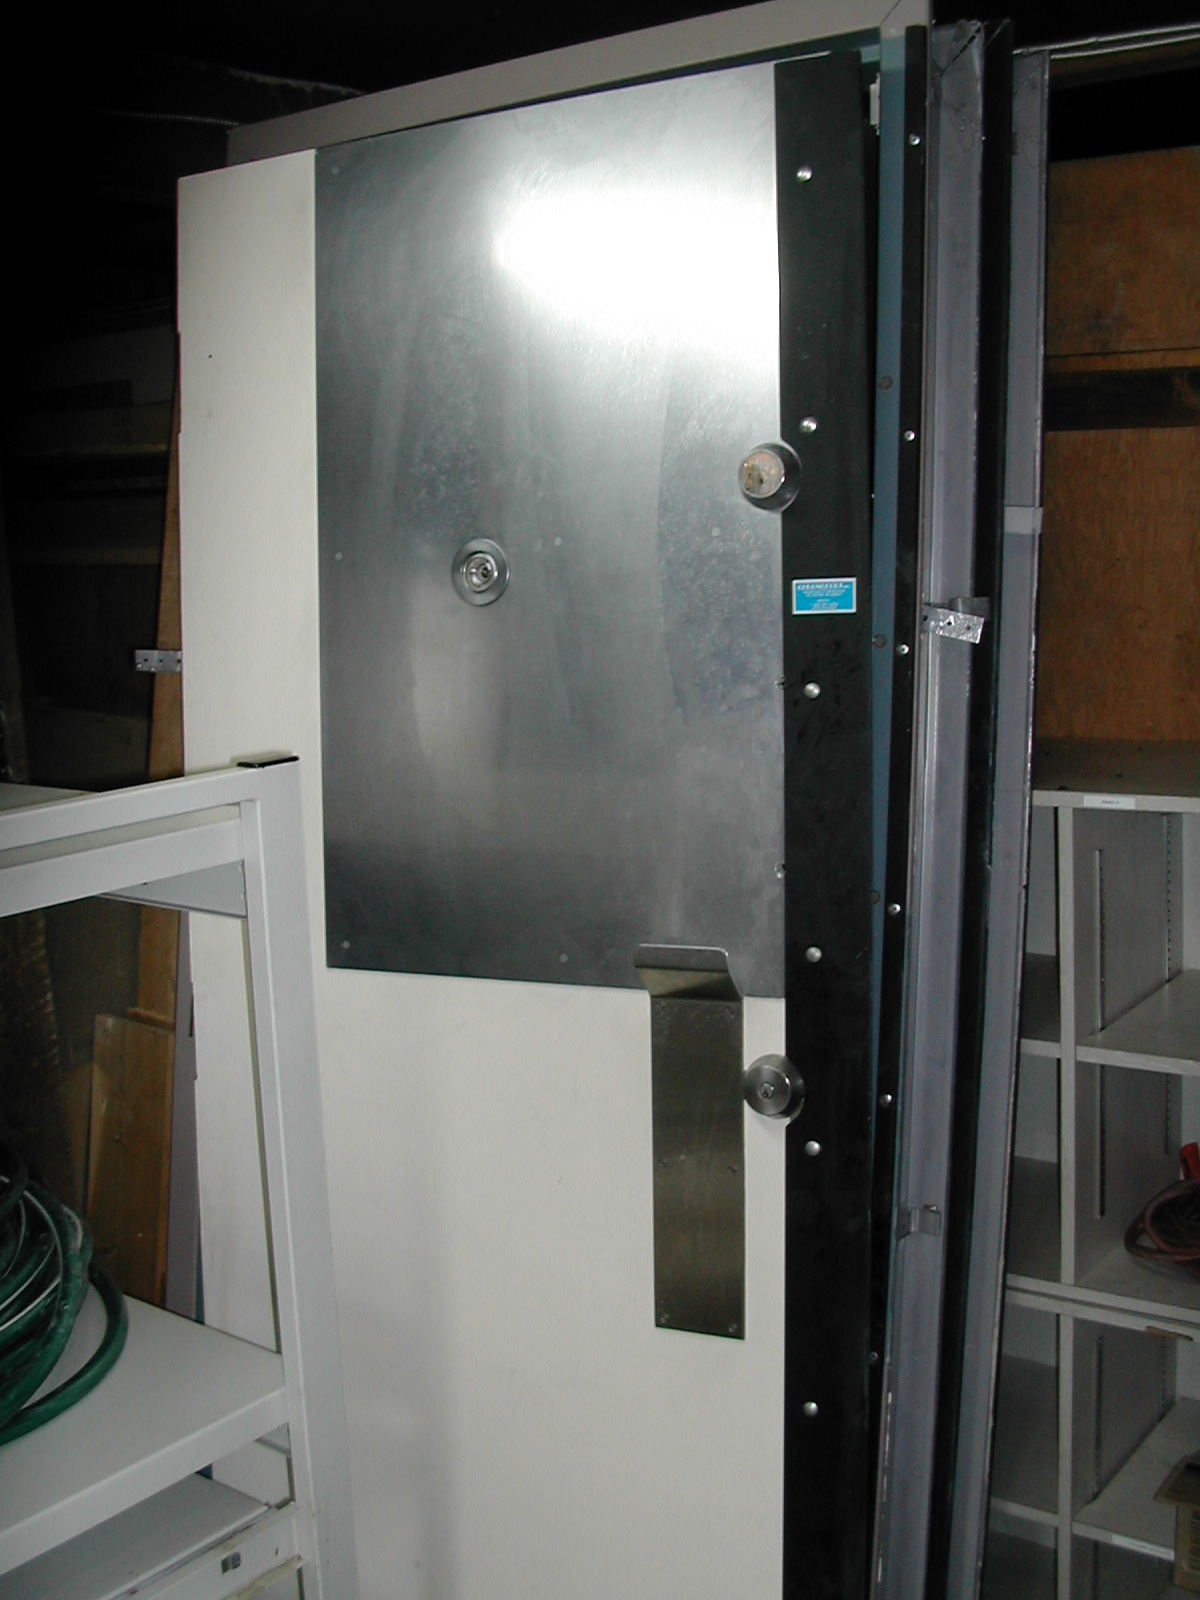 porte blind e de banque 32x80 vient avec 4 barils medeco il magique grand angle de tr s. Black Bedroom Furniture Sets. Home Design Ideas